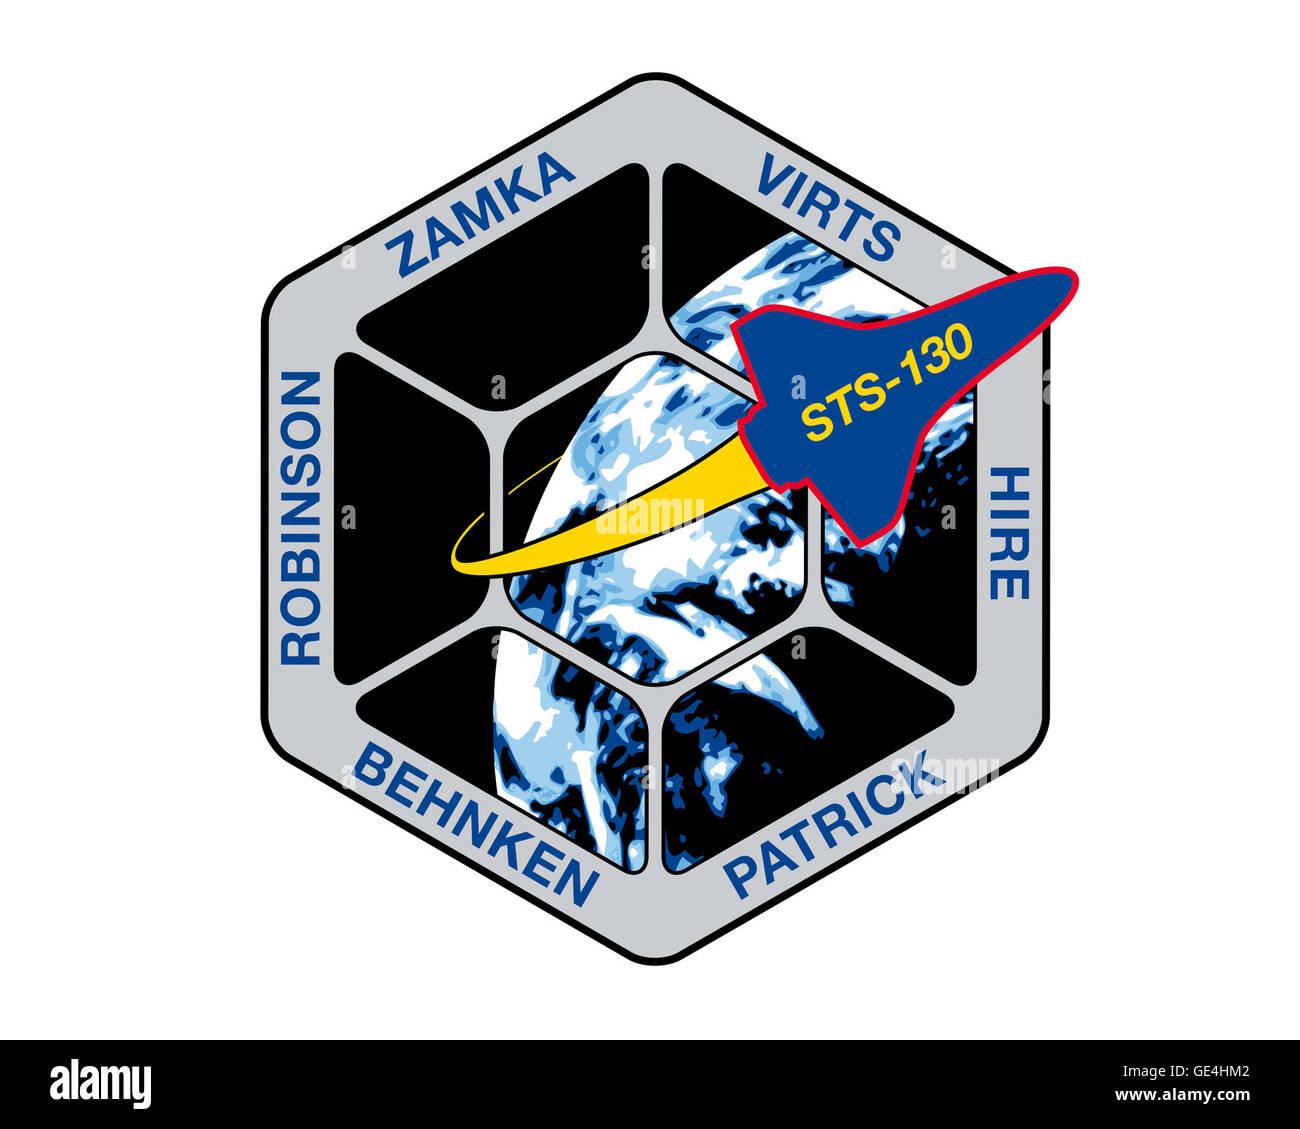 Launch: February 8, 2010, 4:14 am EST Landing: February 21, 2010, 10:20 pm EST, Kennedy Space Center Space Shuttle: Stock Photo